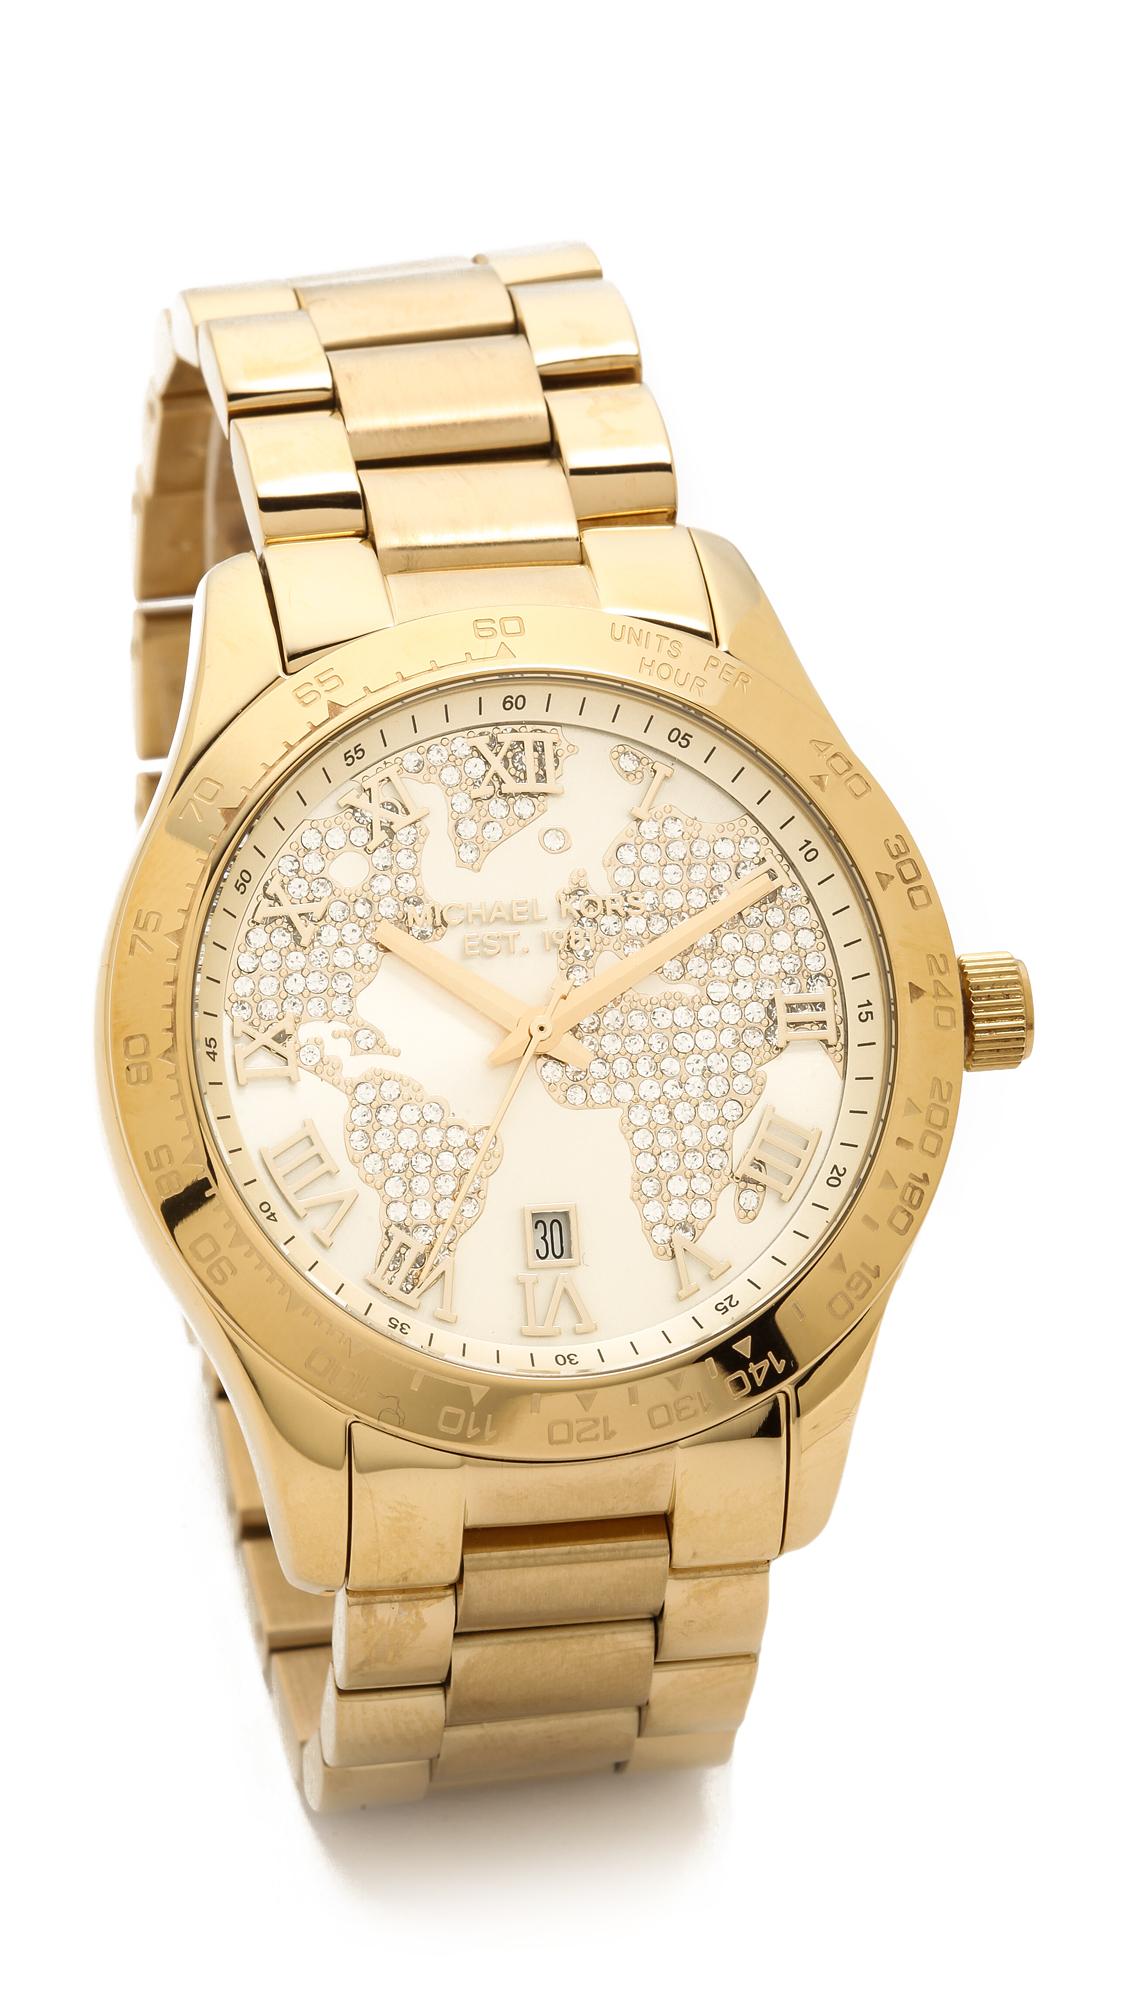 World Map Watch Michael Kors.Lyst Michael Kors Global Glam Layton Watch Gold In Metallic